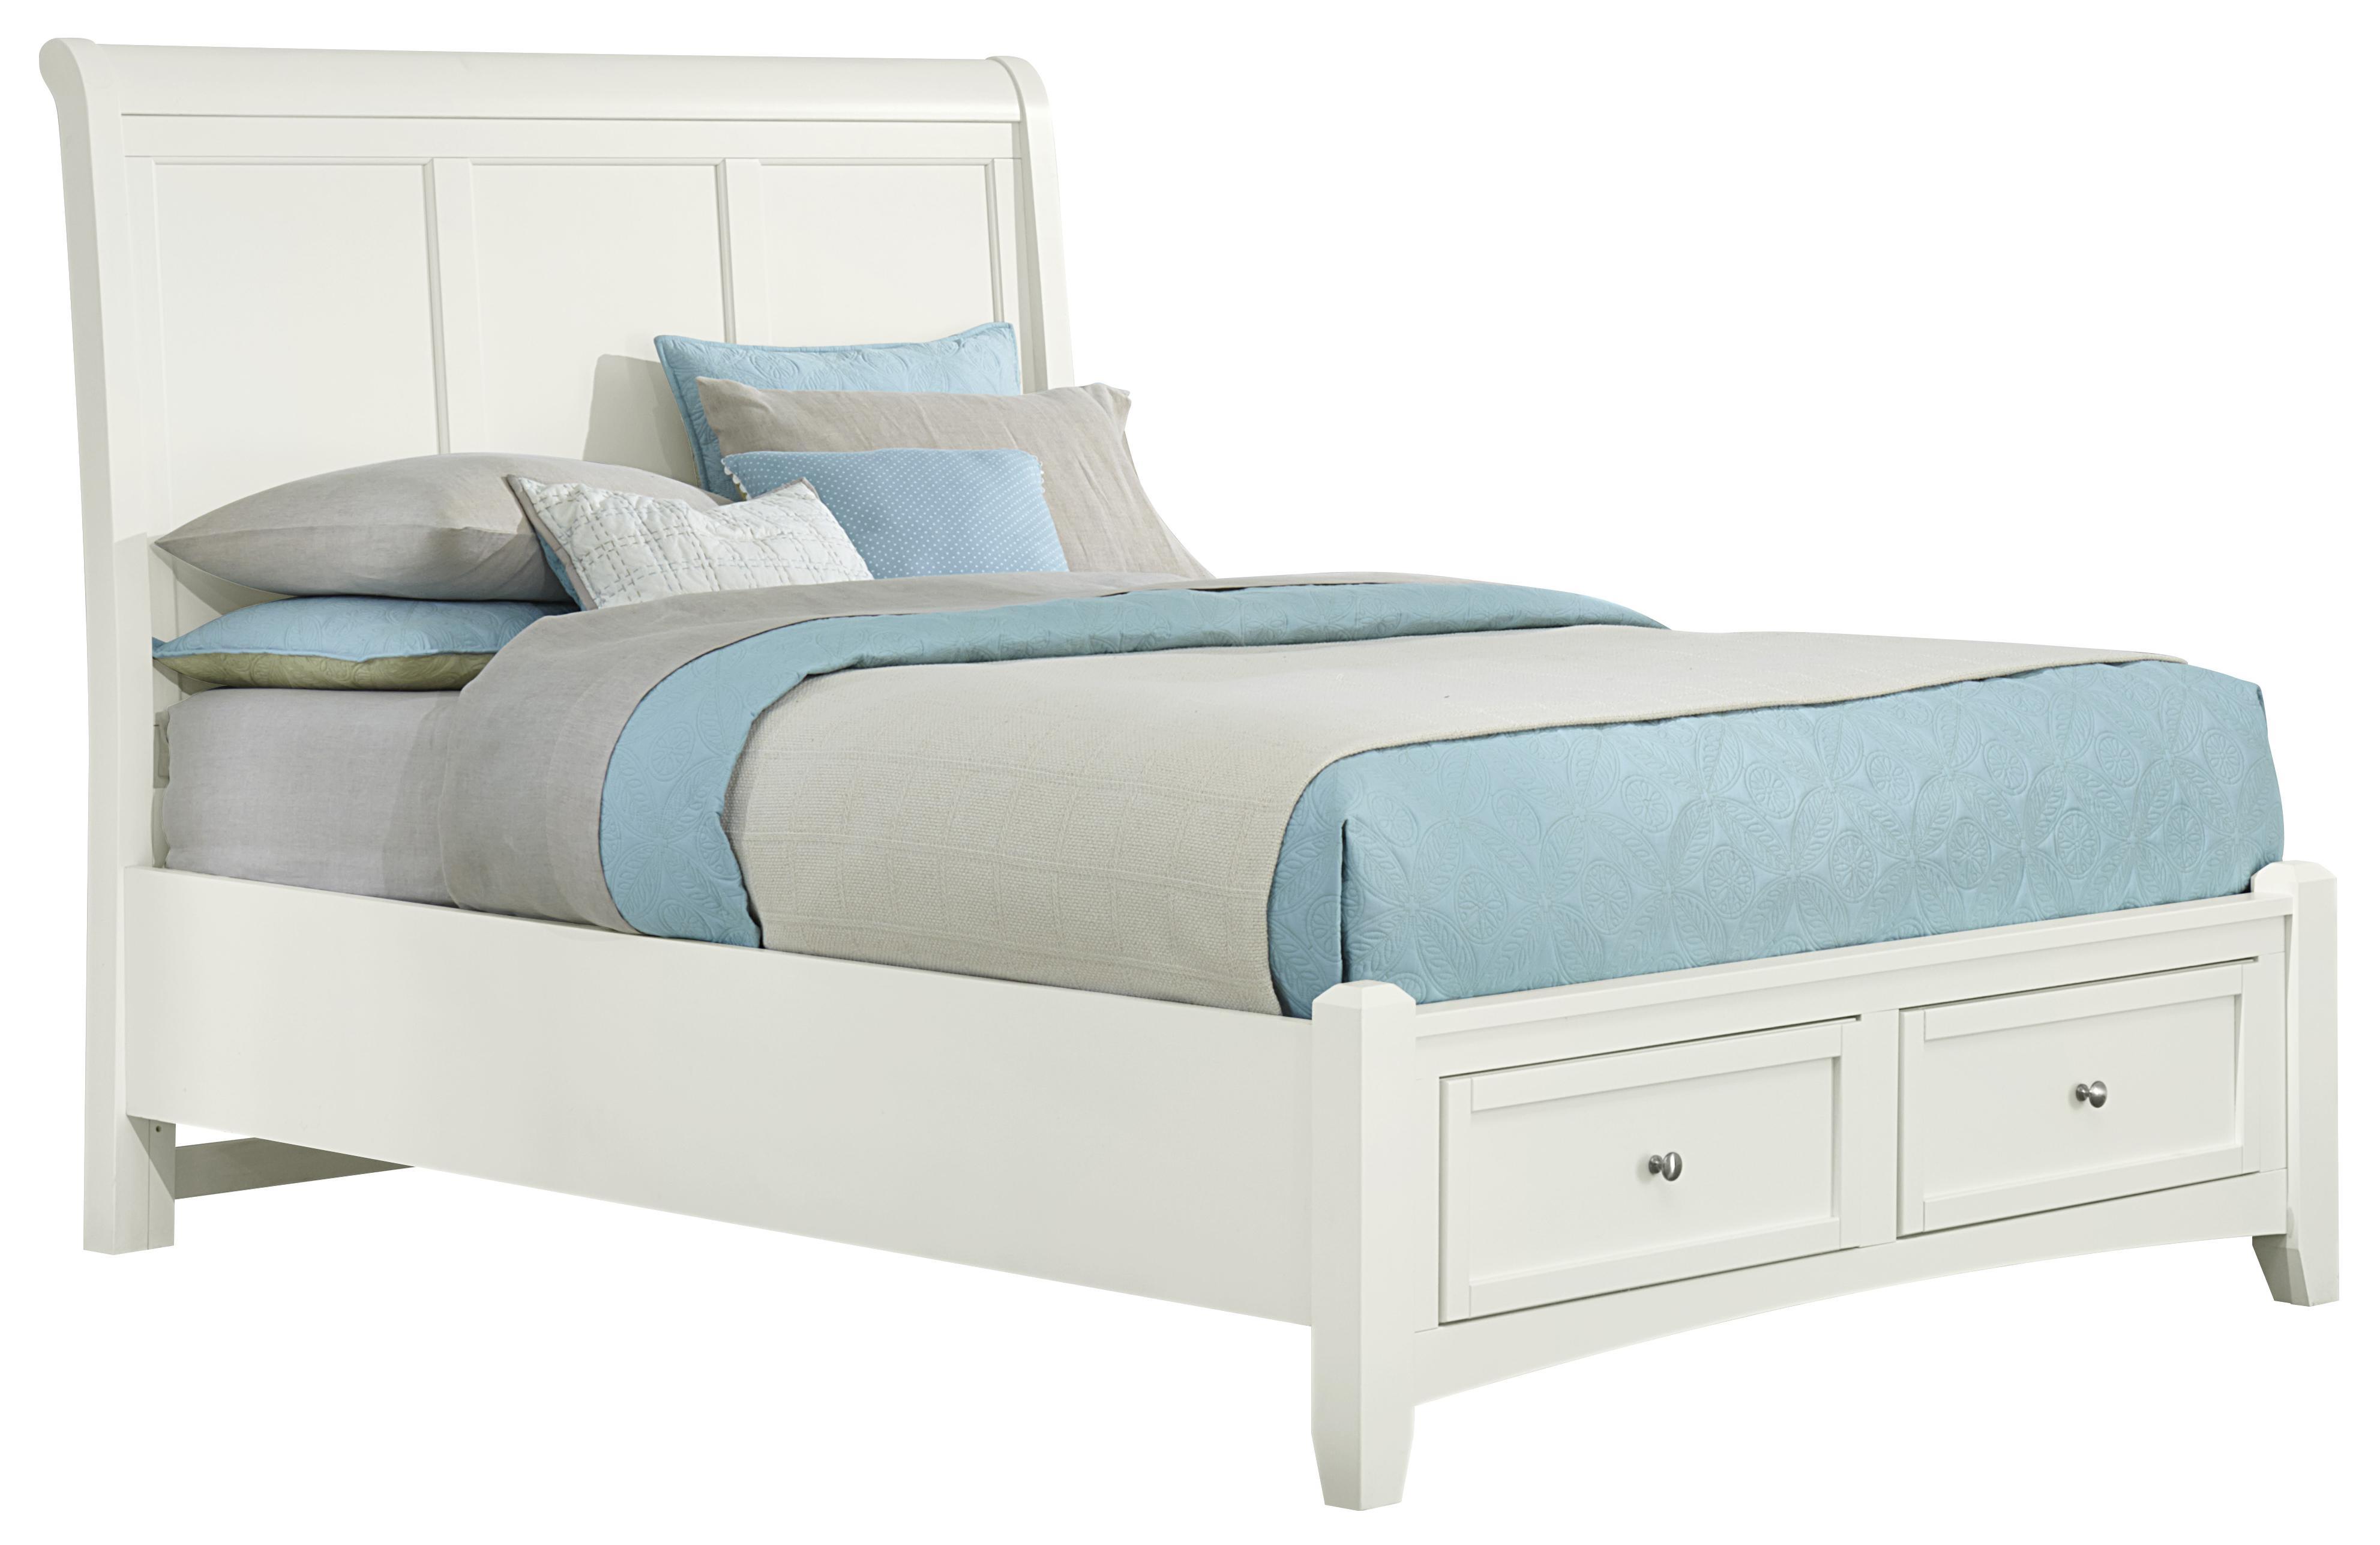 Bonanza Queen Sleigh Storage Bed by Vaughan Bassett at Northeast Factory Direct